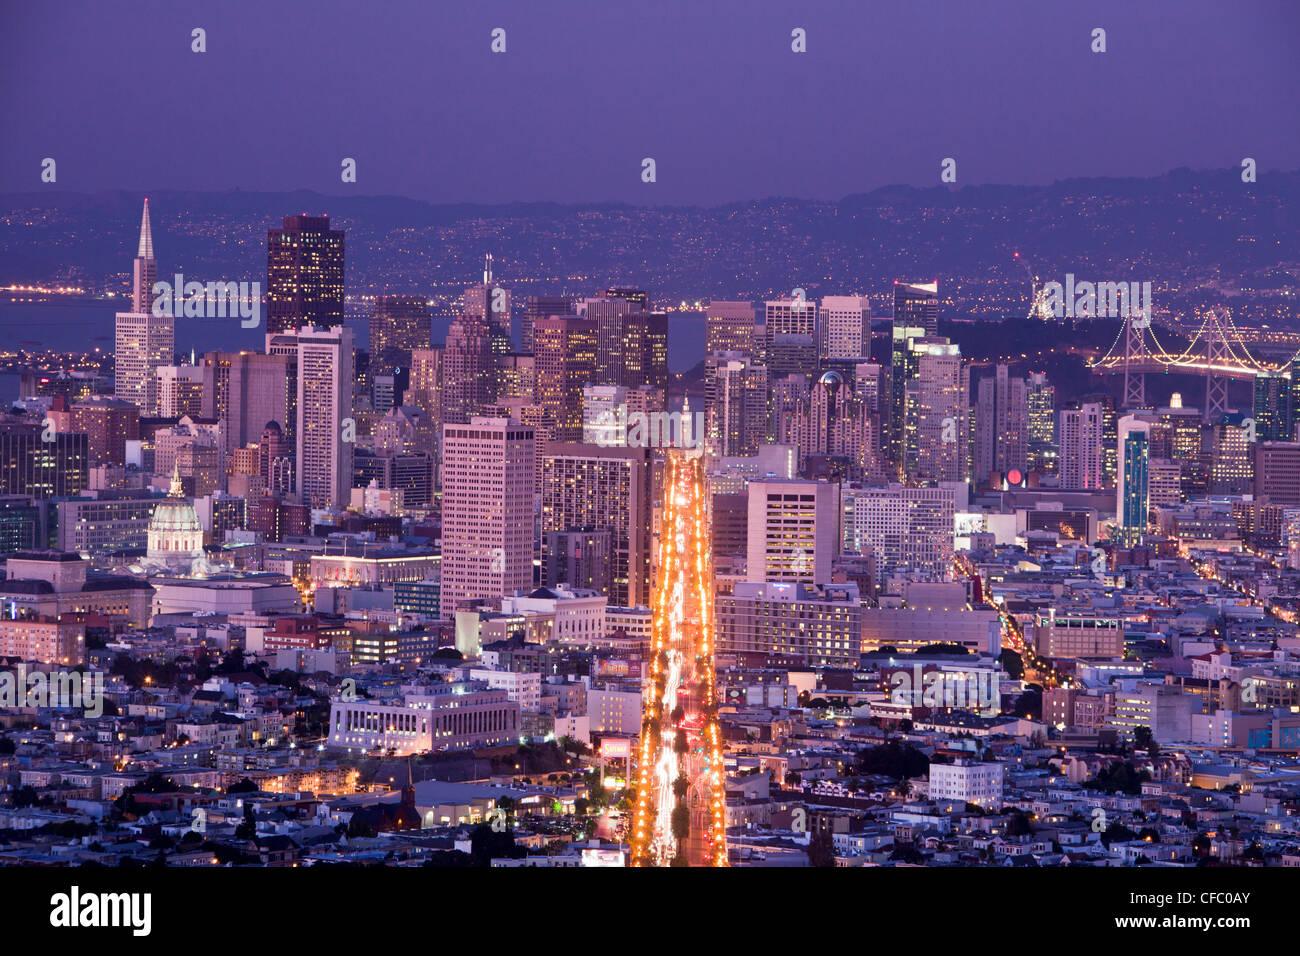 USA, USA, Amerika, Kalifornien, San Francisco, Stadt, Innenstadt, Market Street, Architektur, Bay, downtown, berühmt, Stockbild